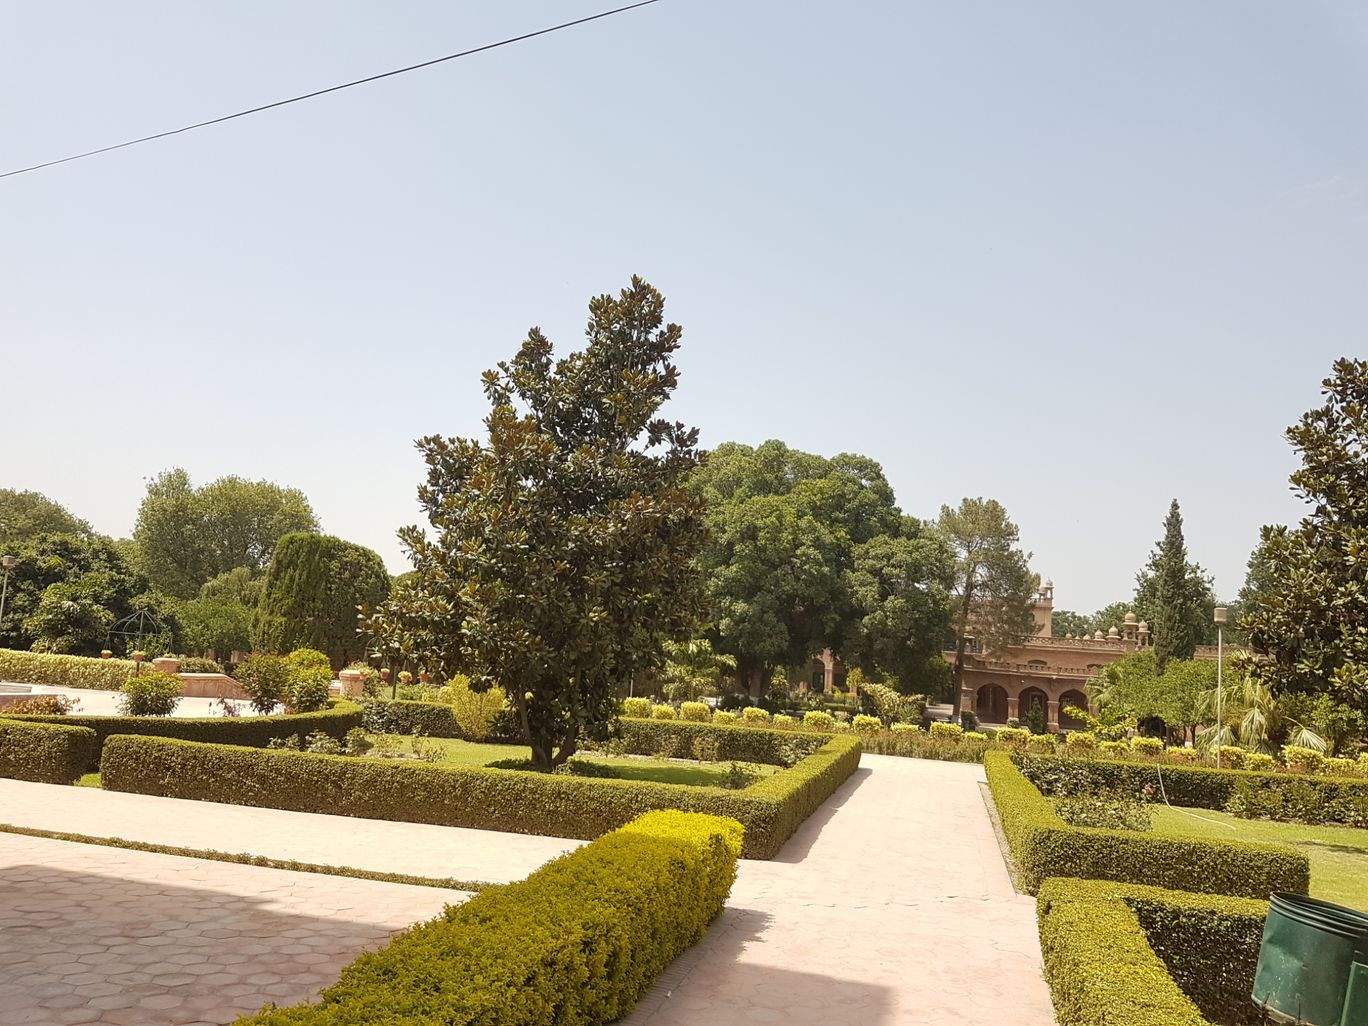 Photo of Islamia College University Peshawar By Muhammad Rajab